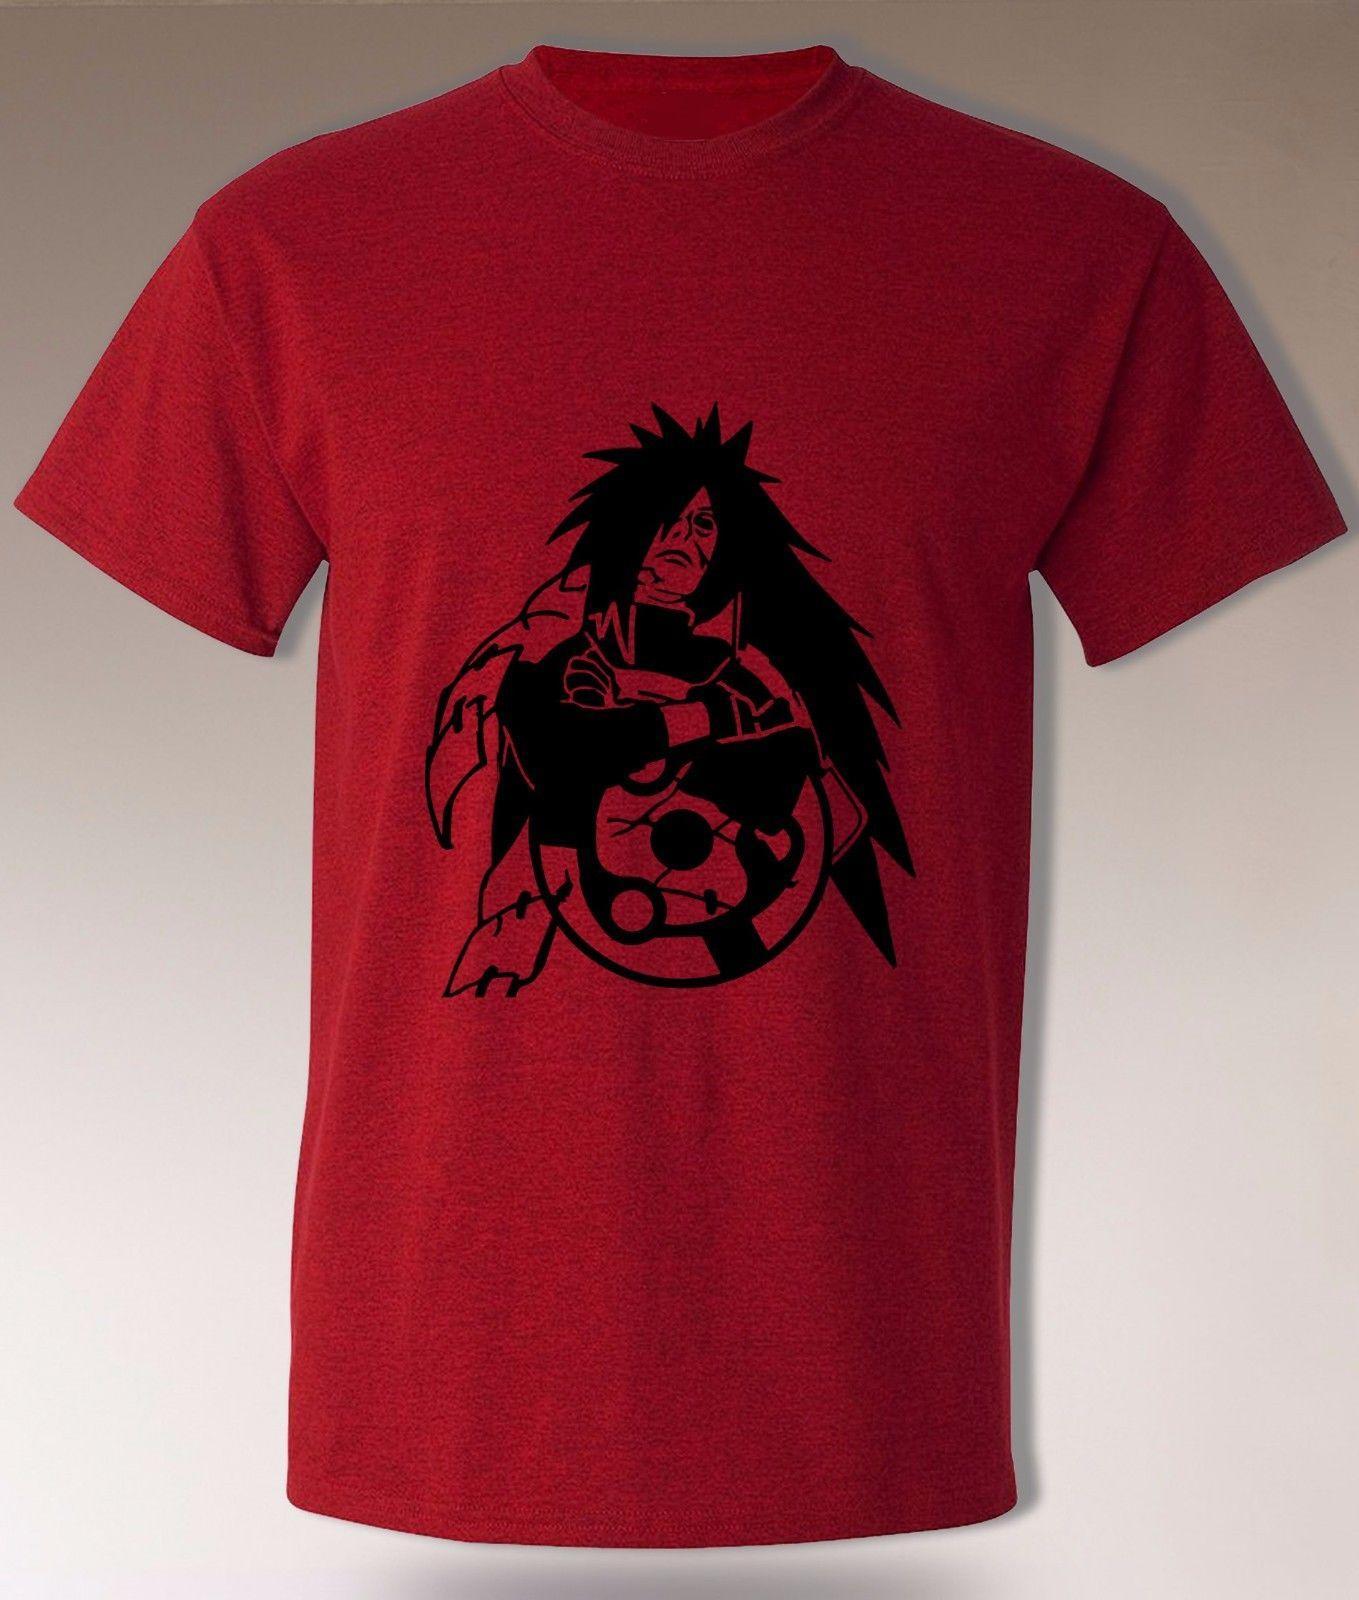 8b9b1366 Madara Uchiha T Sharingan Akatsuki Naruto Anime Ninja Cosplay Tee Top Adult  MensFunny Unisex Casual Crazy T Shirt Design Comedy T Shirt From  Tshirtkidd, ...